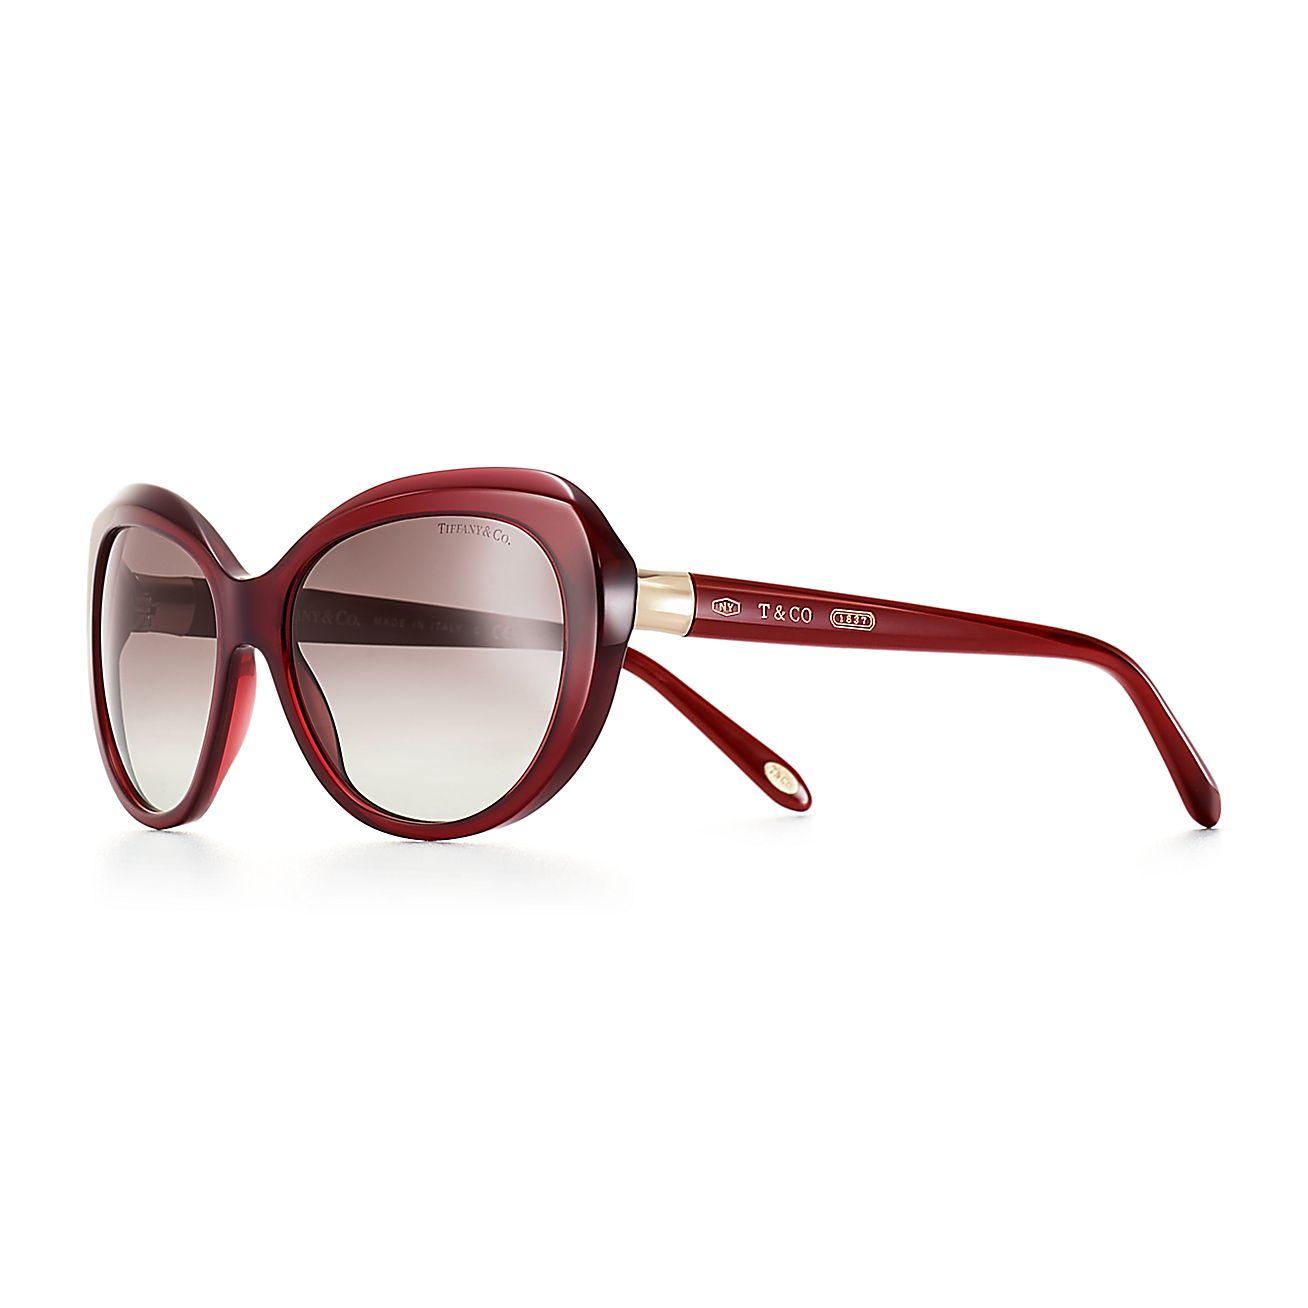 594431bbe62 Tiffany Metal Cat Eye Sunglasses - Bitterroot Public Library